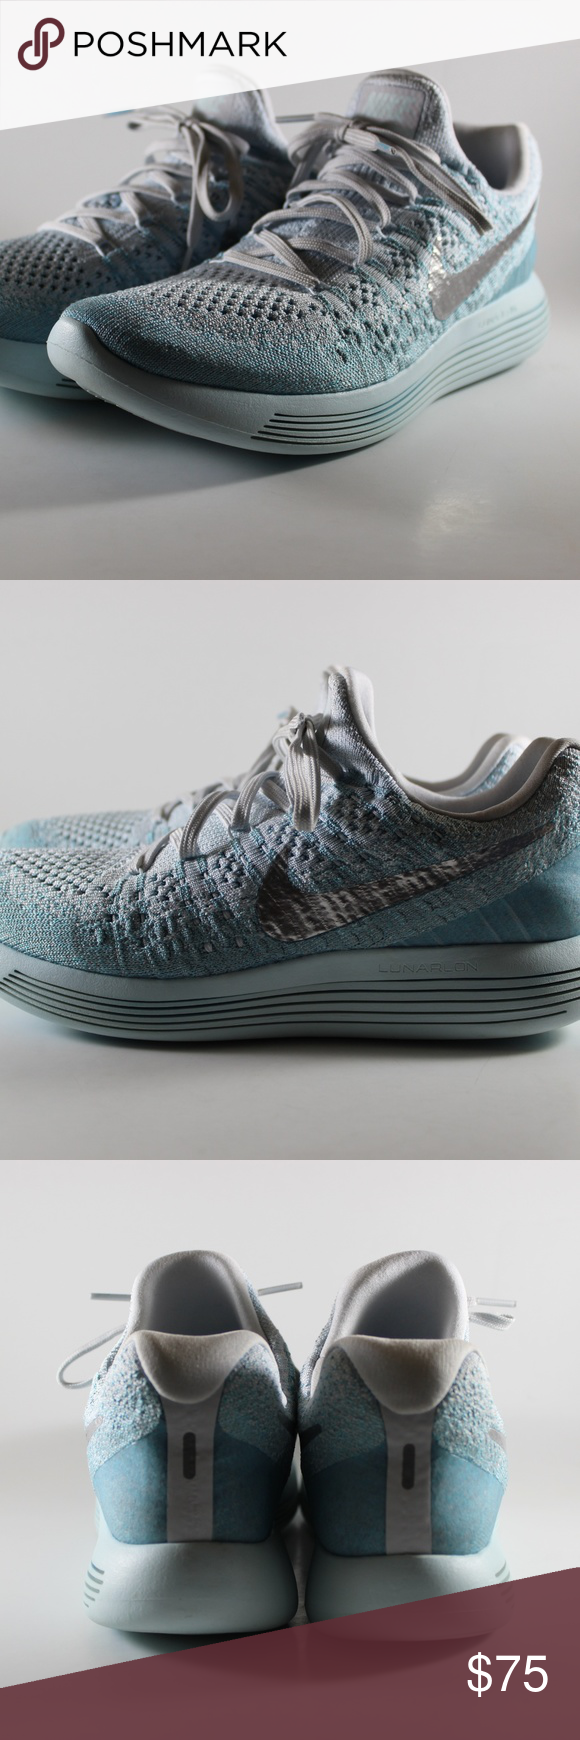 4a1c51380e8b NIKE LUNAREPIC LOW FLYKNIT 2 RUNNING SHOES WOMEN NIKE LUNAREPIC LOW FLYKNIT  2 RUNNING SHOES WOMEN 9.5 863780-405 GLACIER BLUE Nike Shoes Athletic Shoes